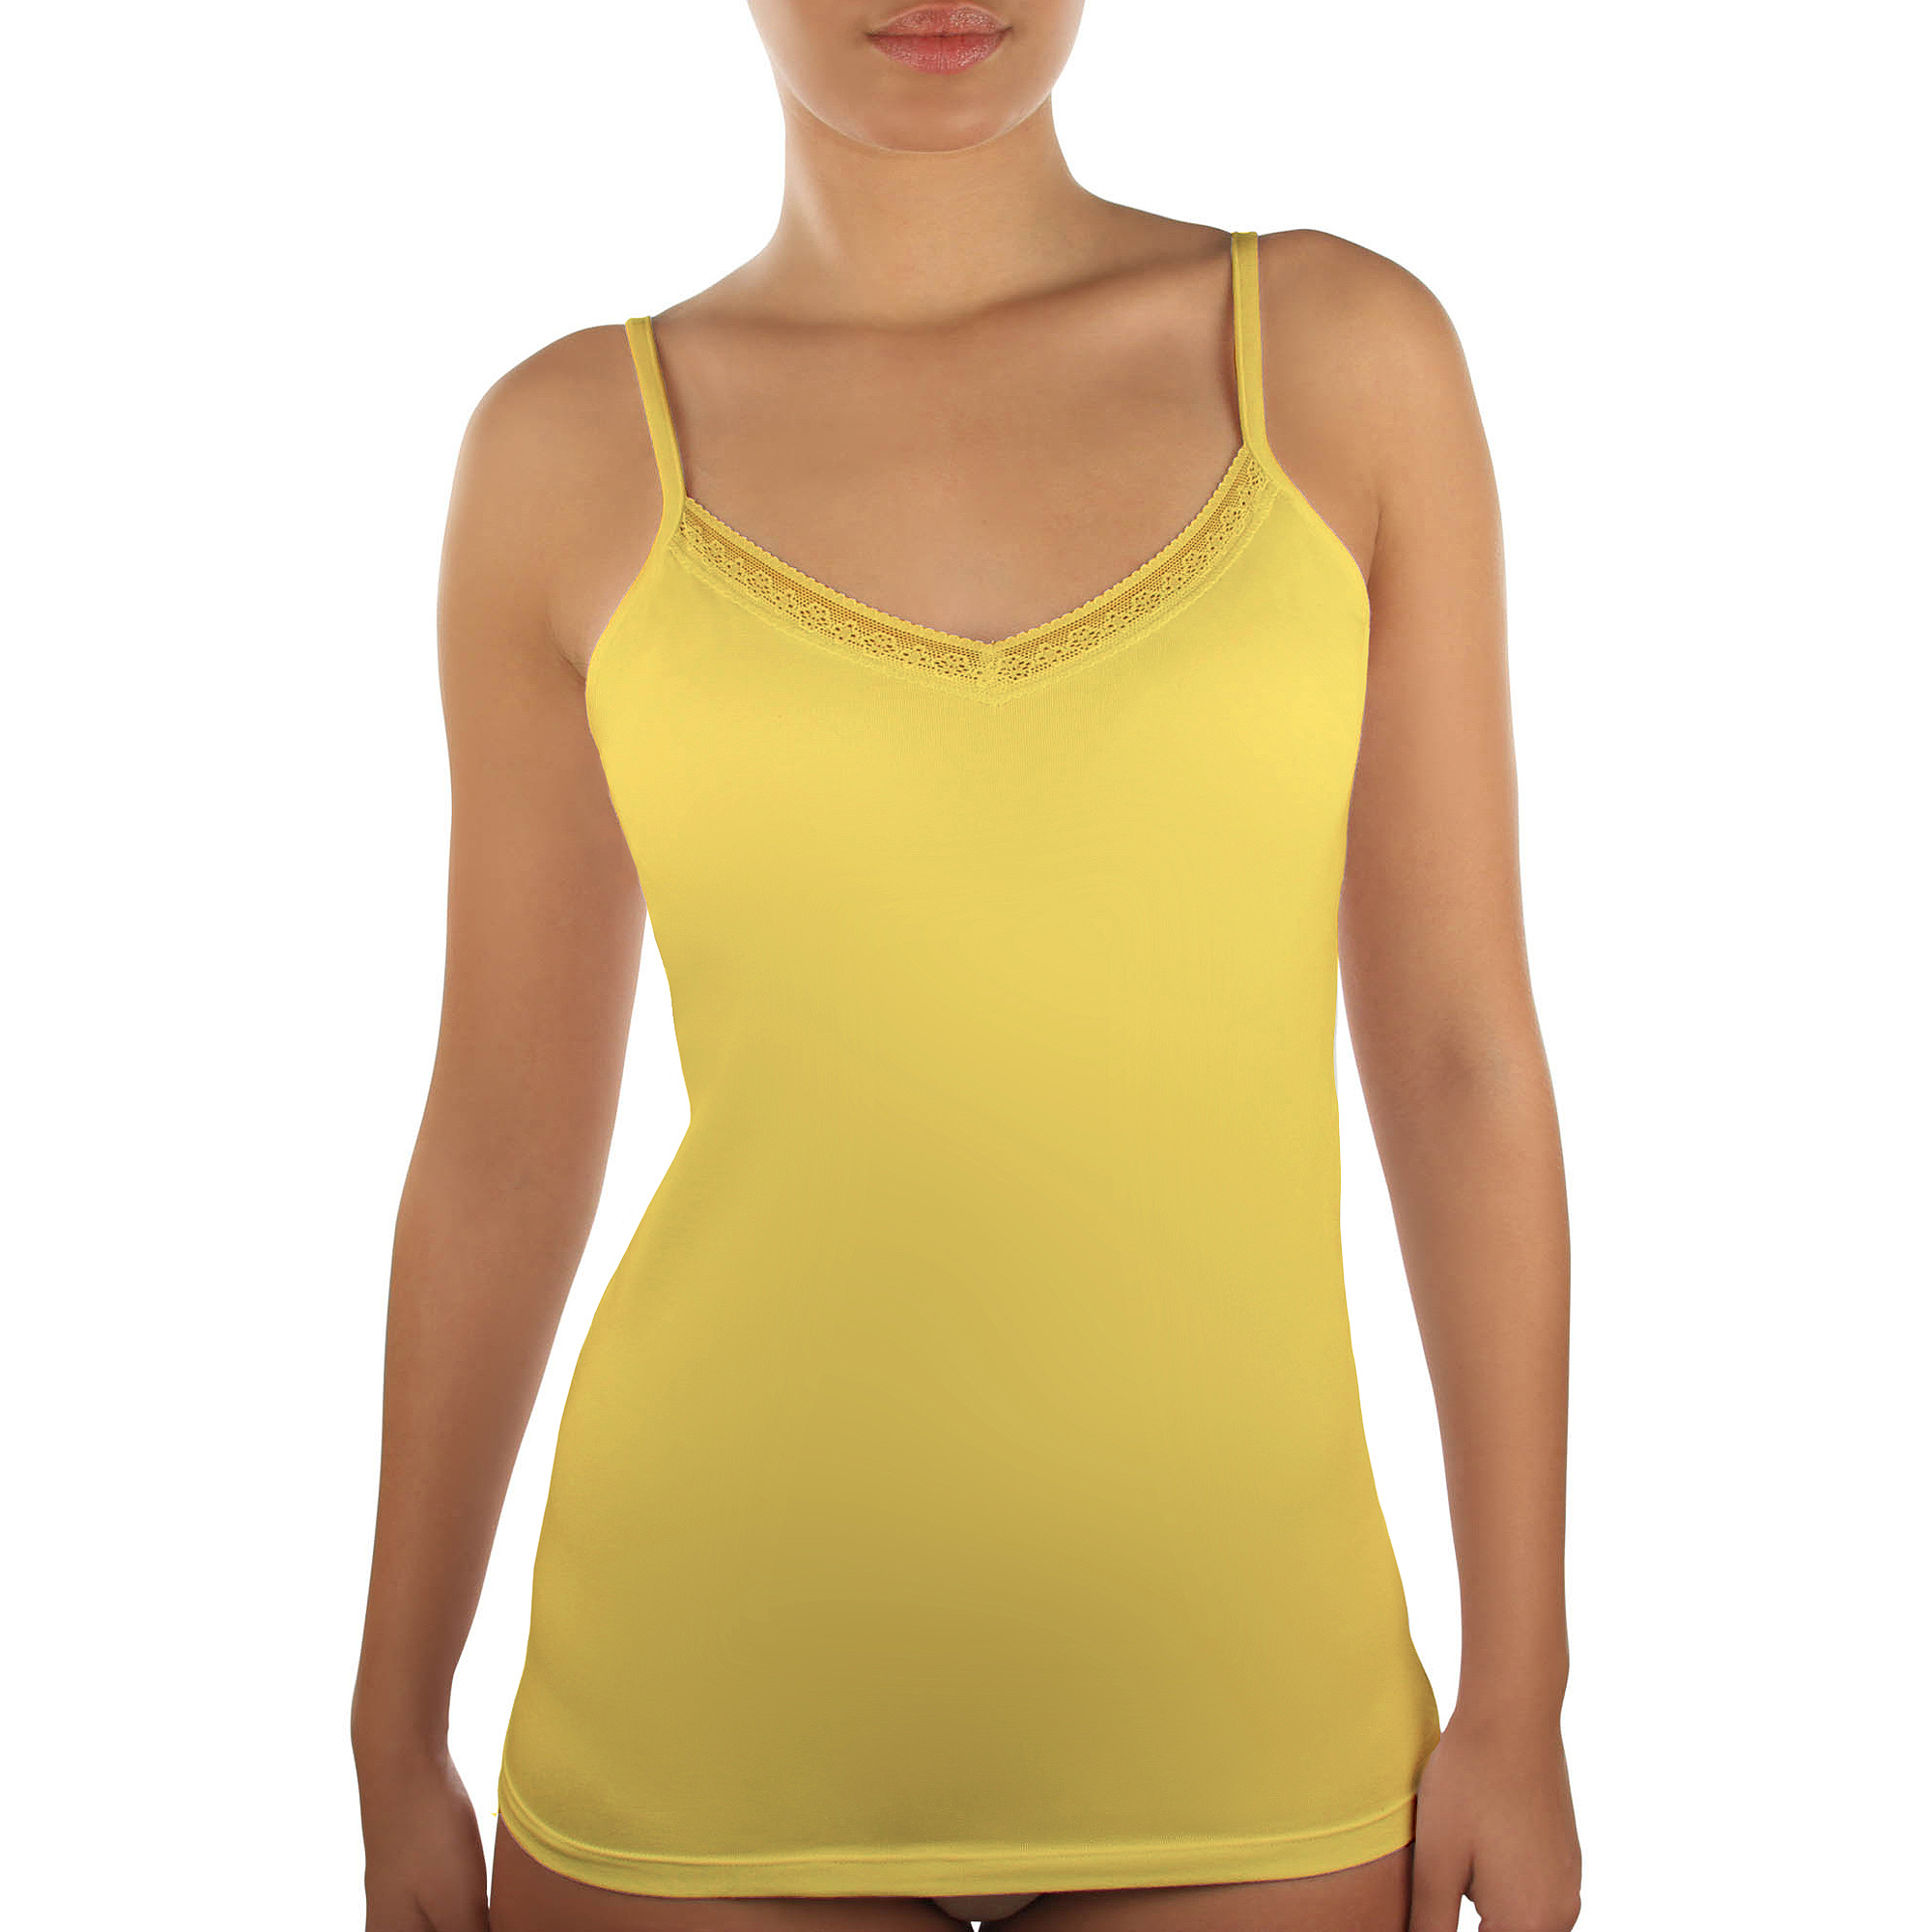 best camisole with shelf bra the best shelf design. Black Bedroom Furniture Sets. Home Design Ideas